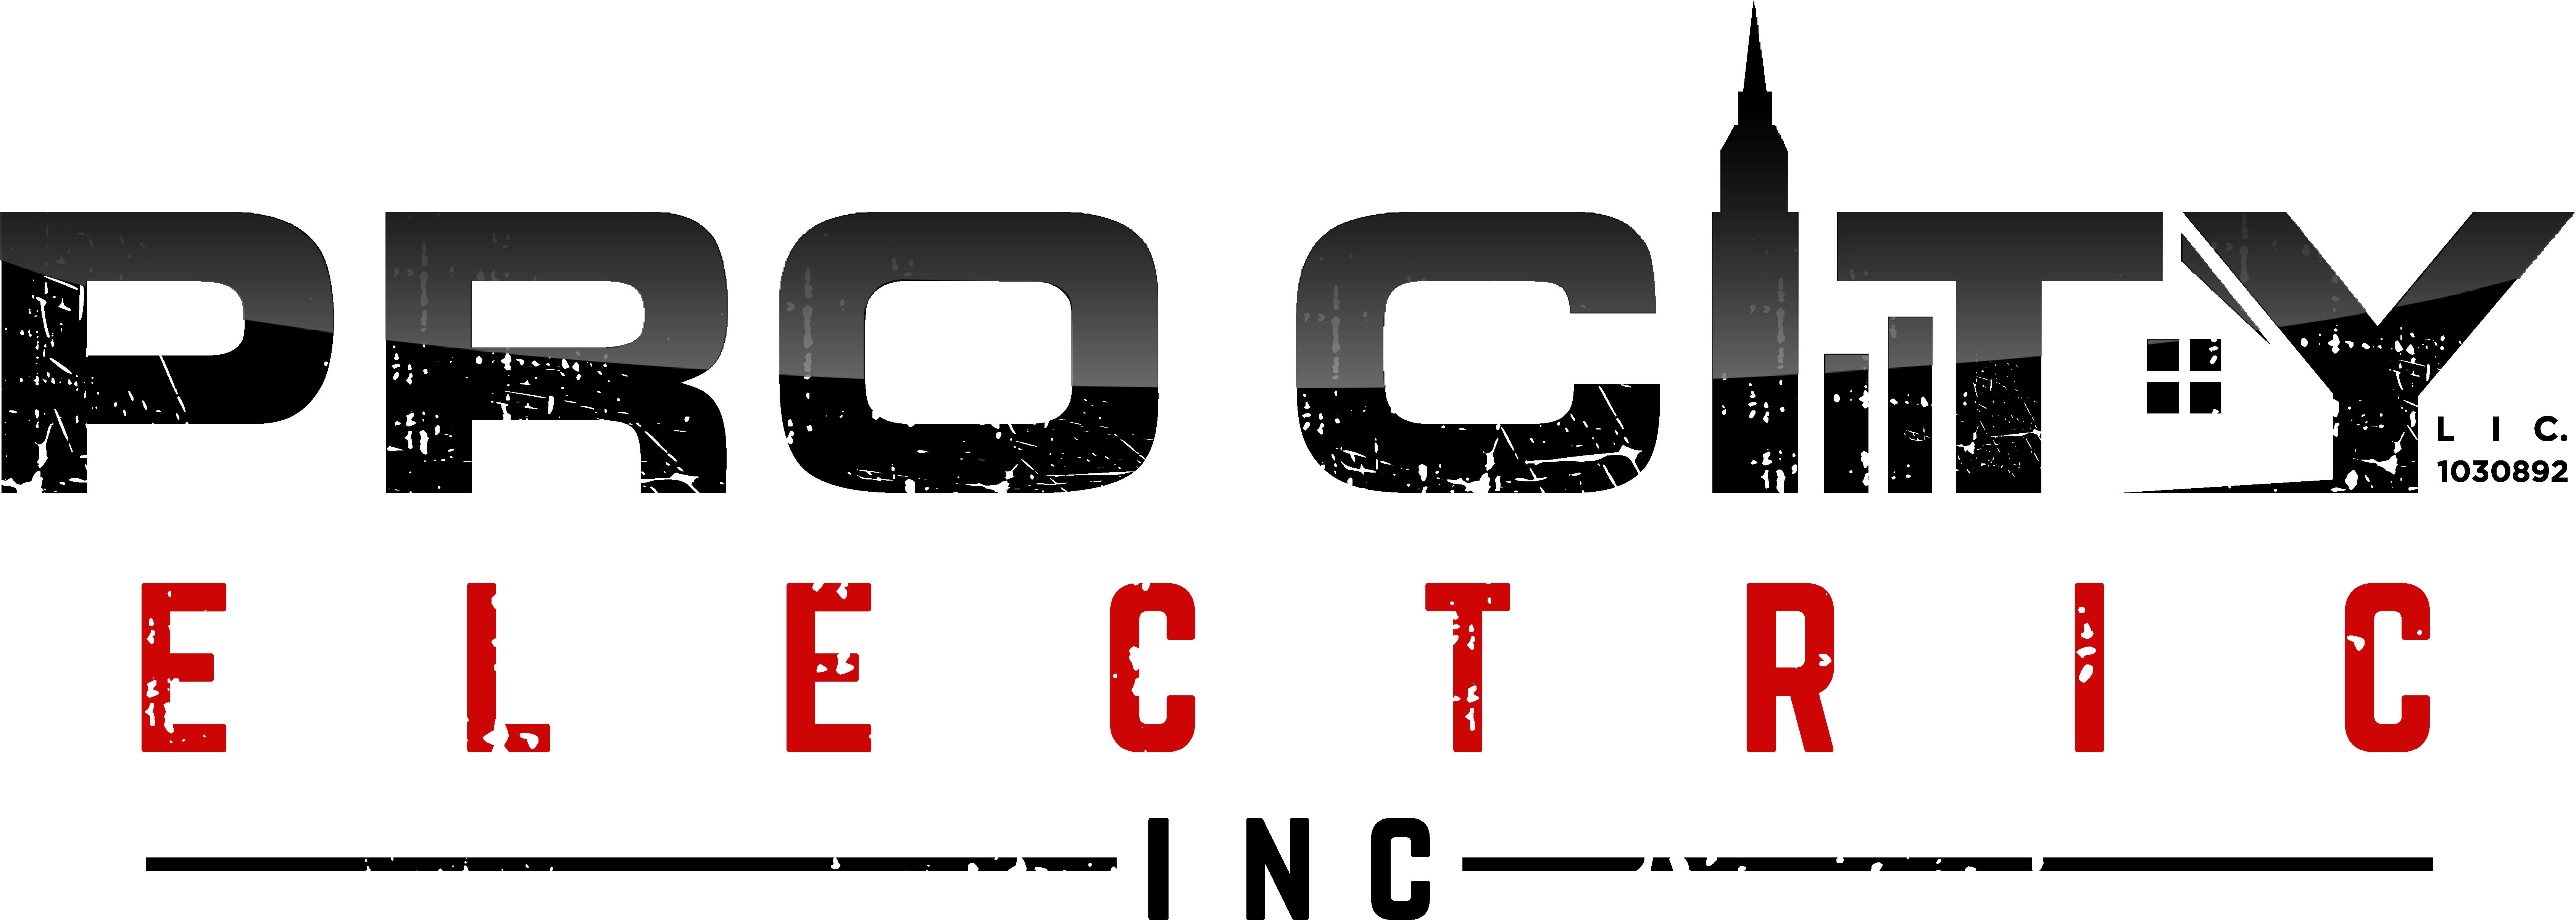 HOLE 1 SPONSOR - Pro City Electric, Inc. - Logo